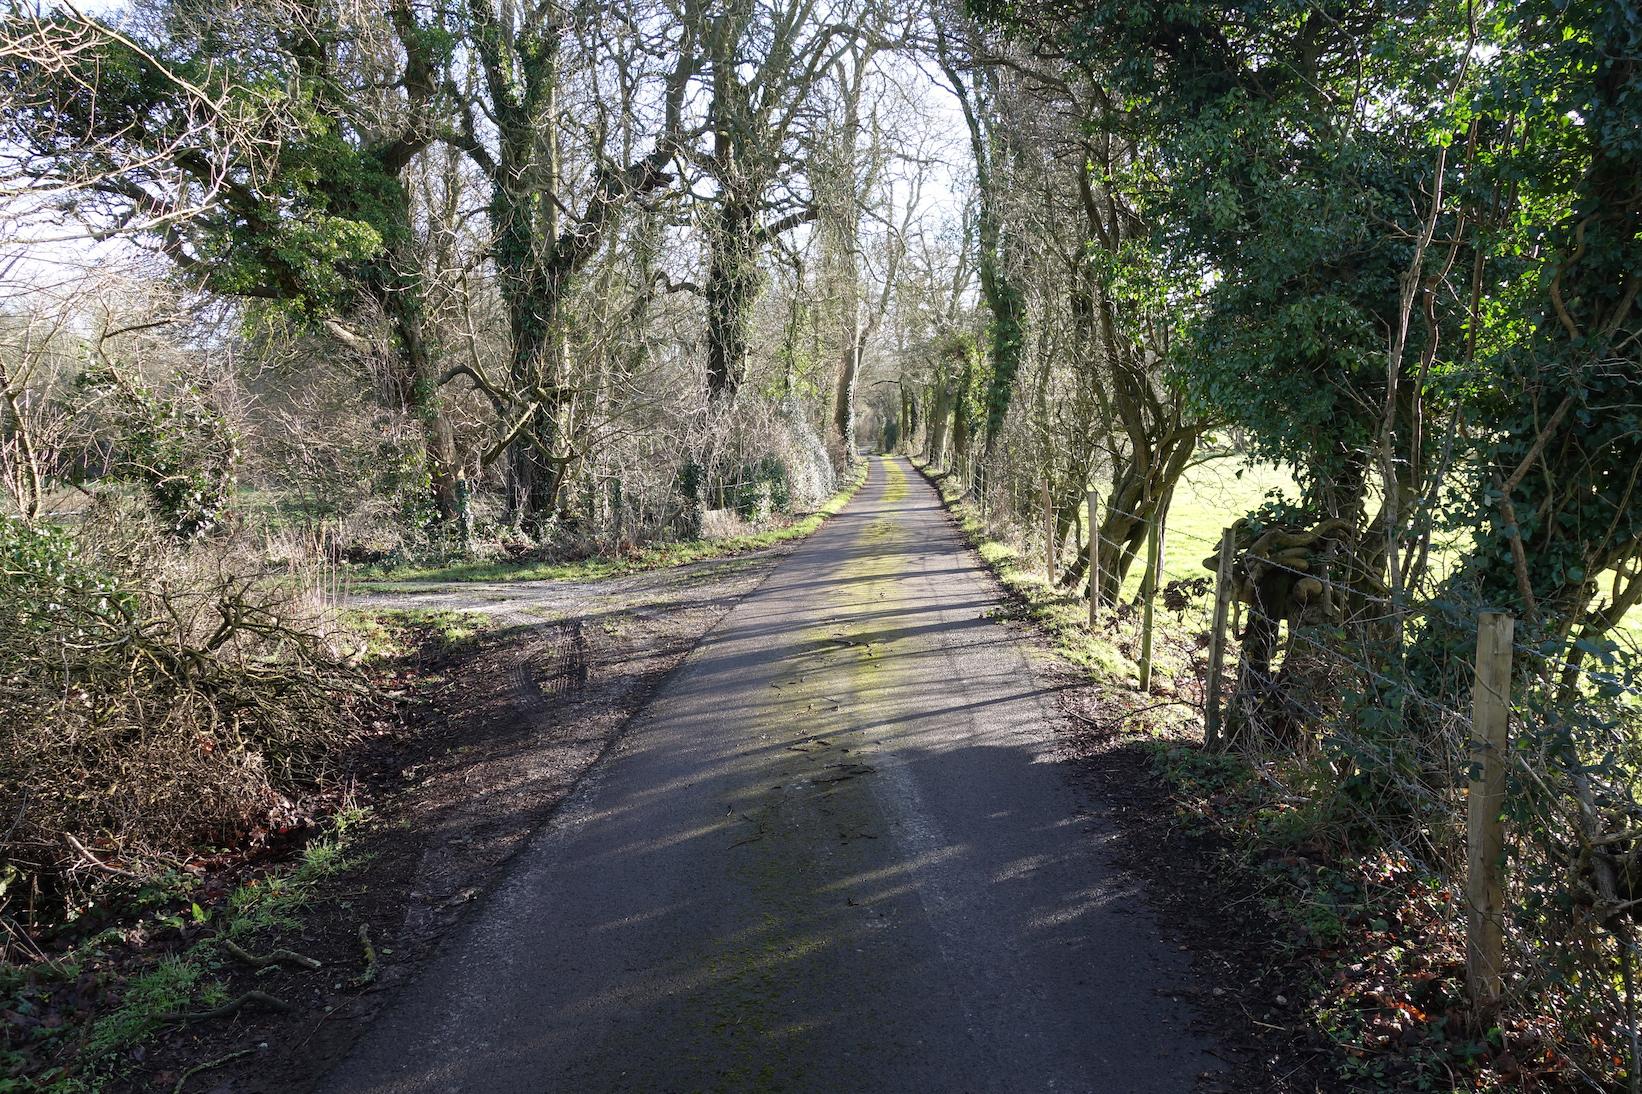 Roadway trail